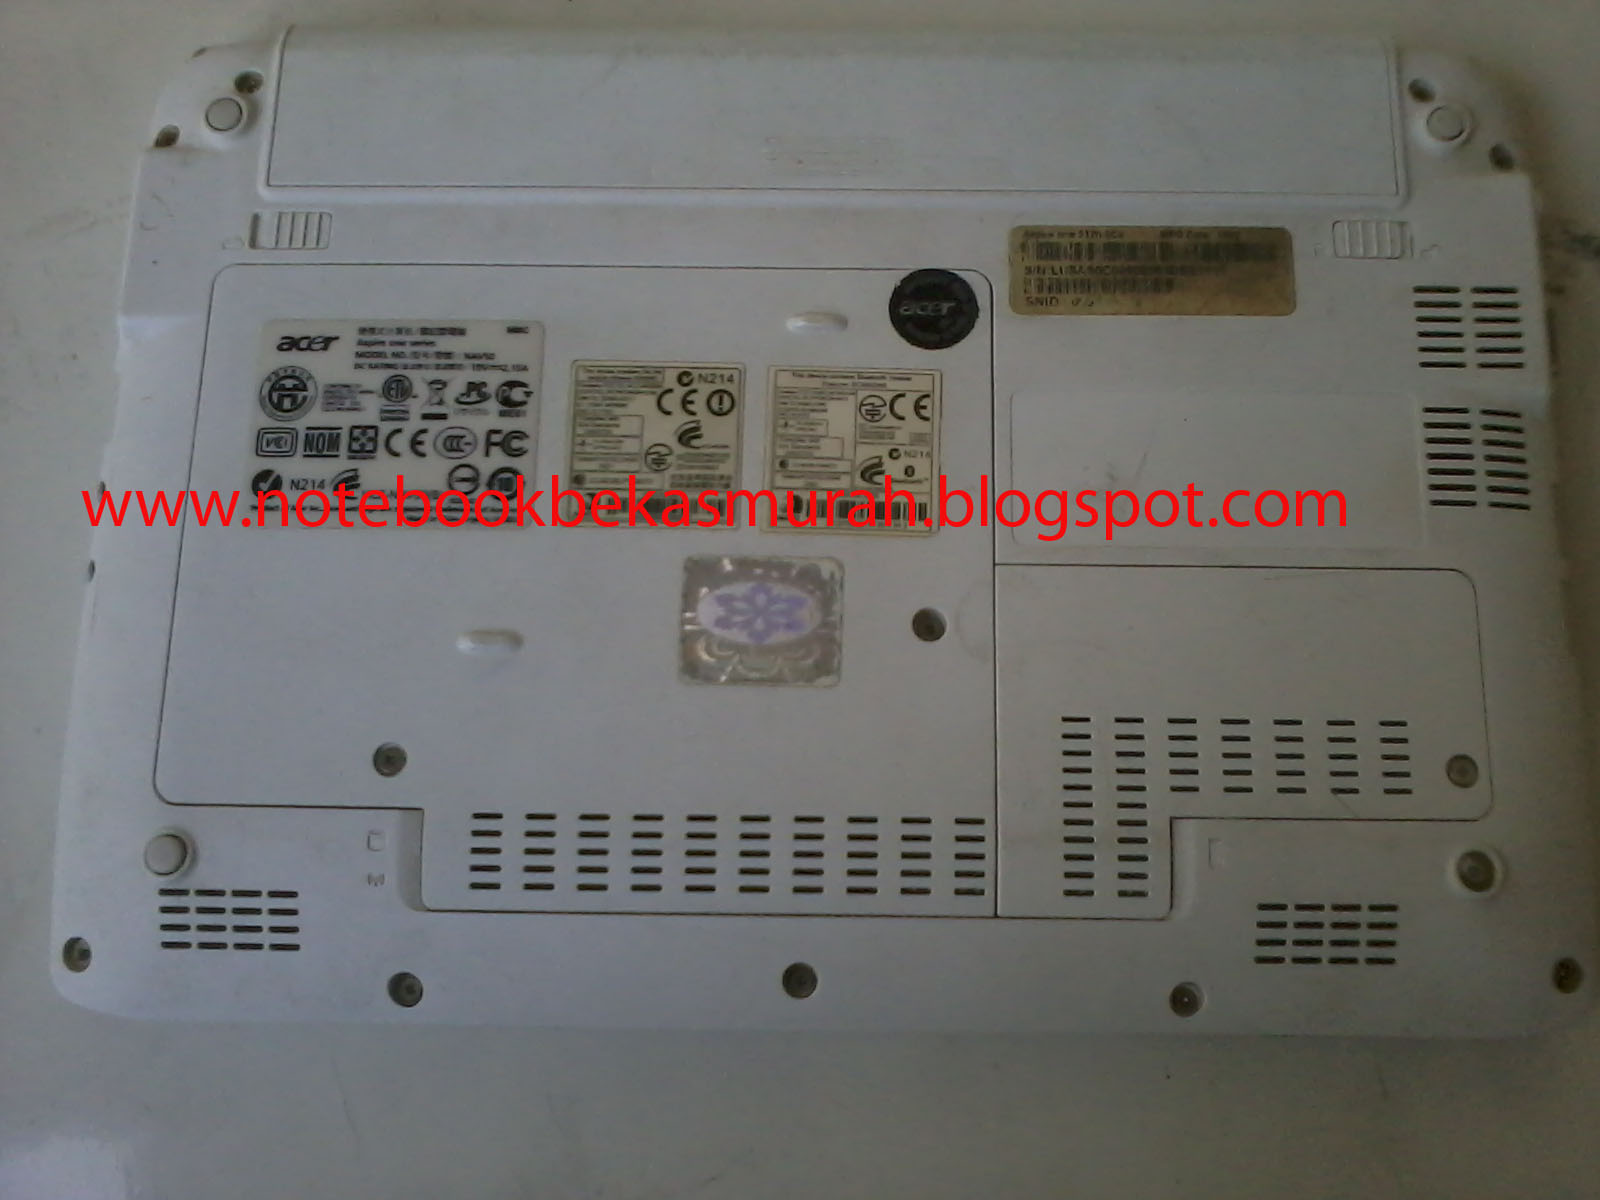 Harga Ic Power Laptop Merk Hp jual laptop bekas murah netbook acer seken murah meriah